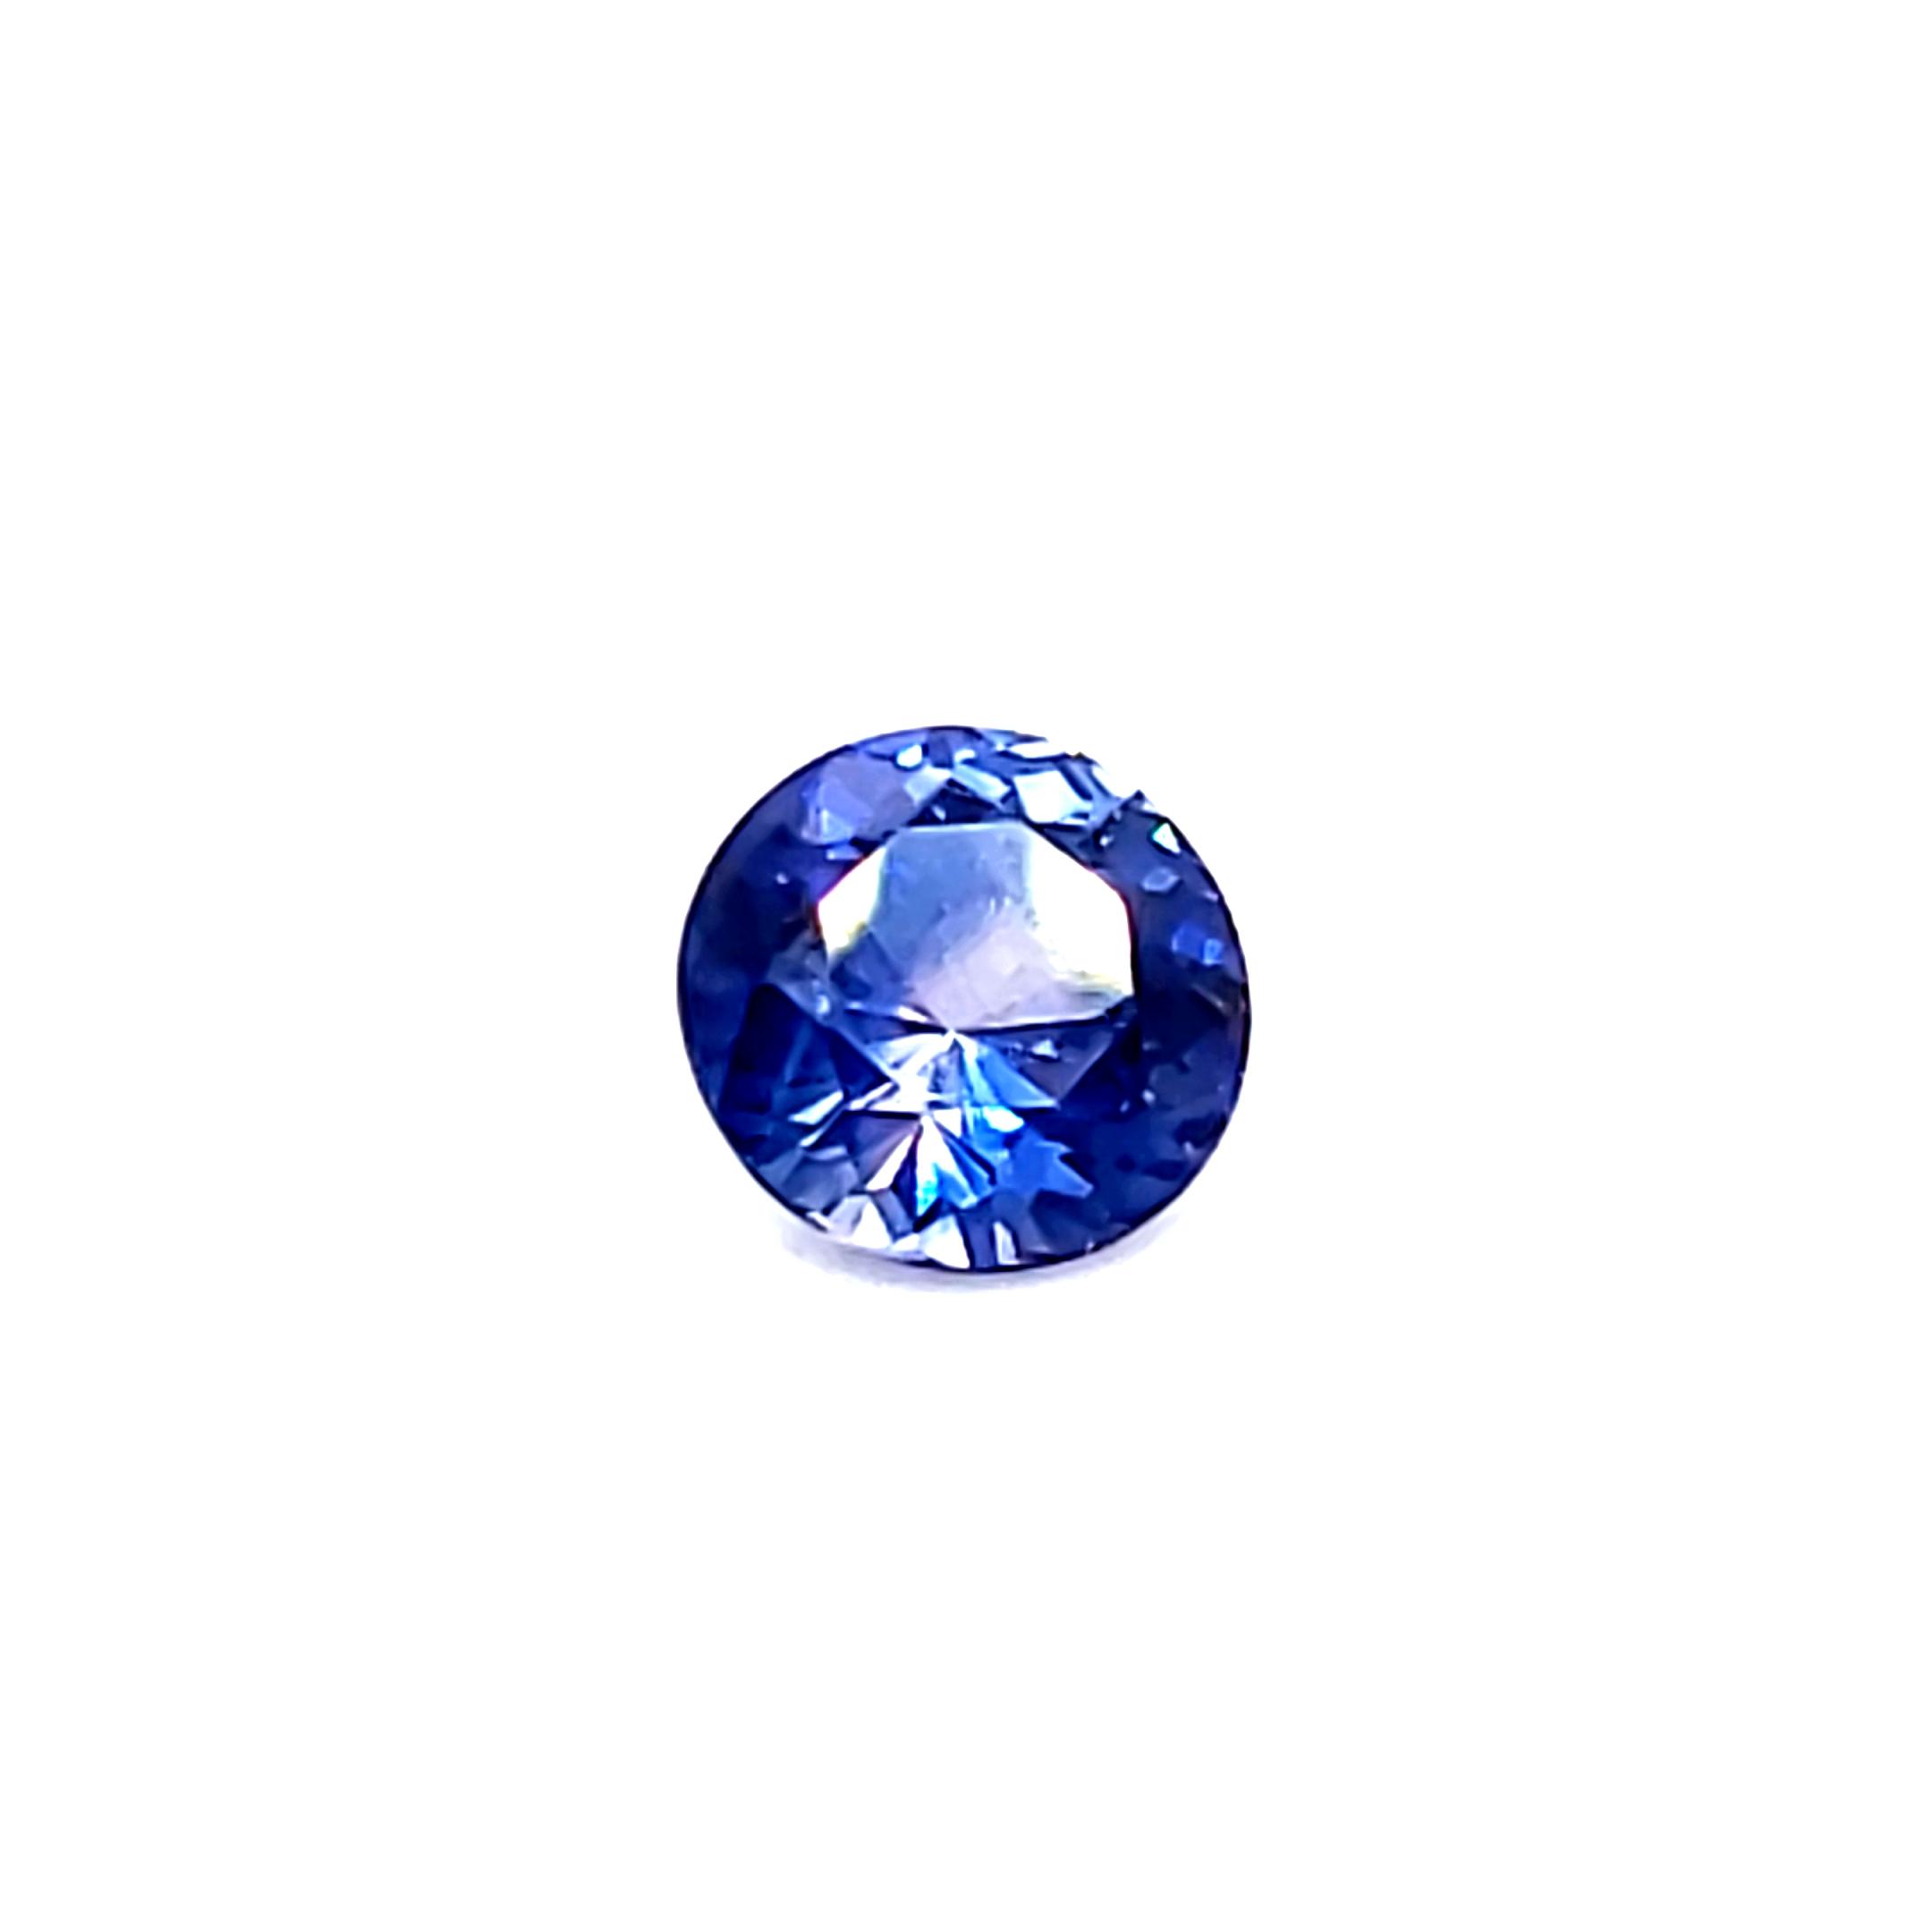 1.00 ct. Blue Sapphire